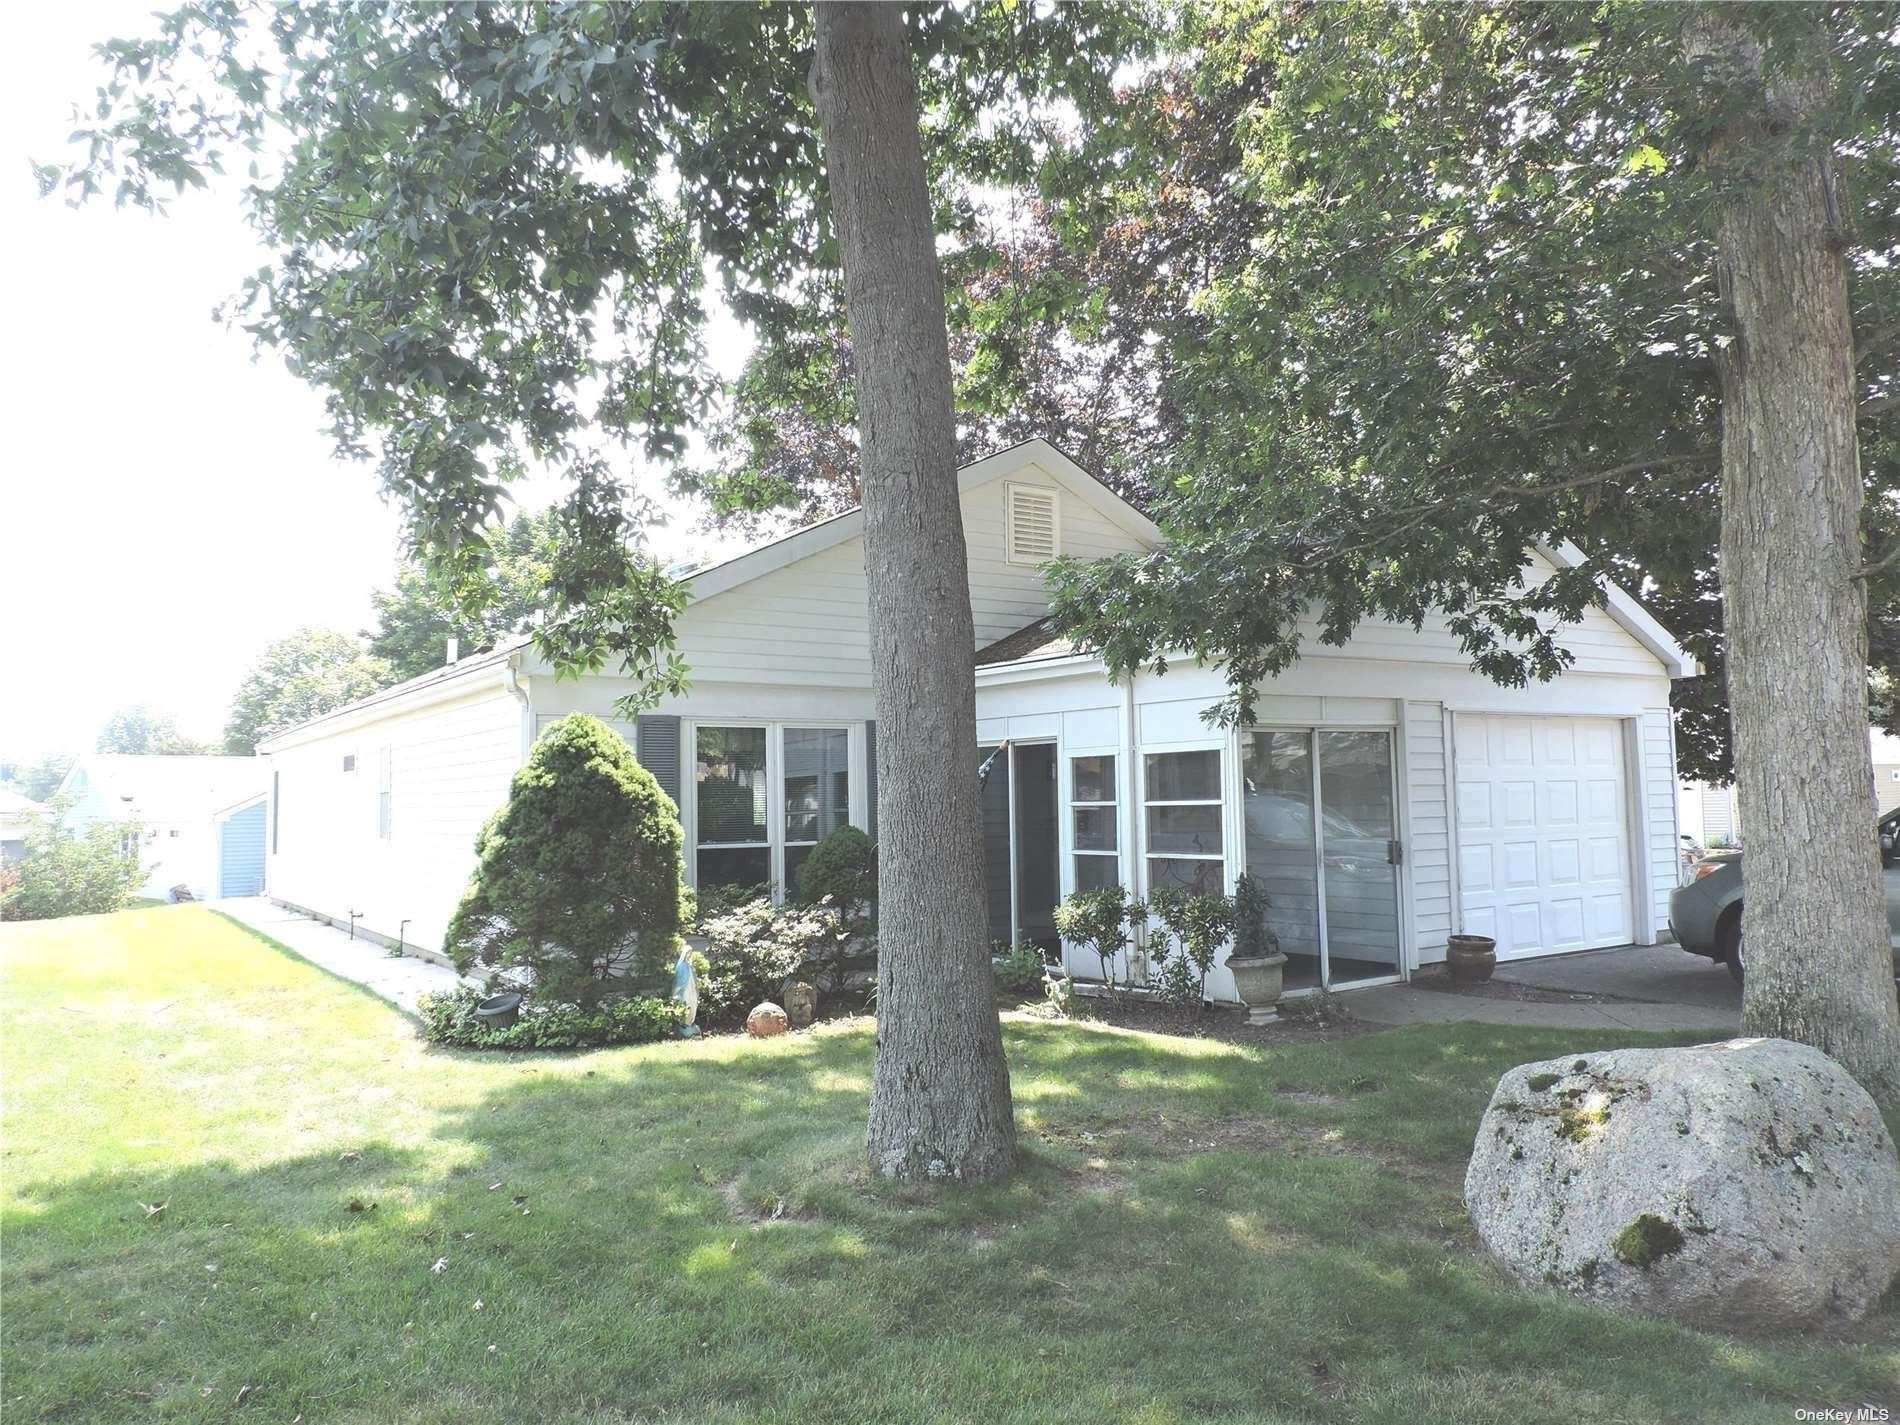 451 Summerwood Court #451, Ridge, NY 11961 - MLS#: 3330784